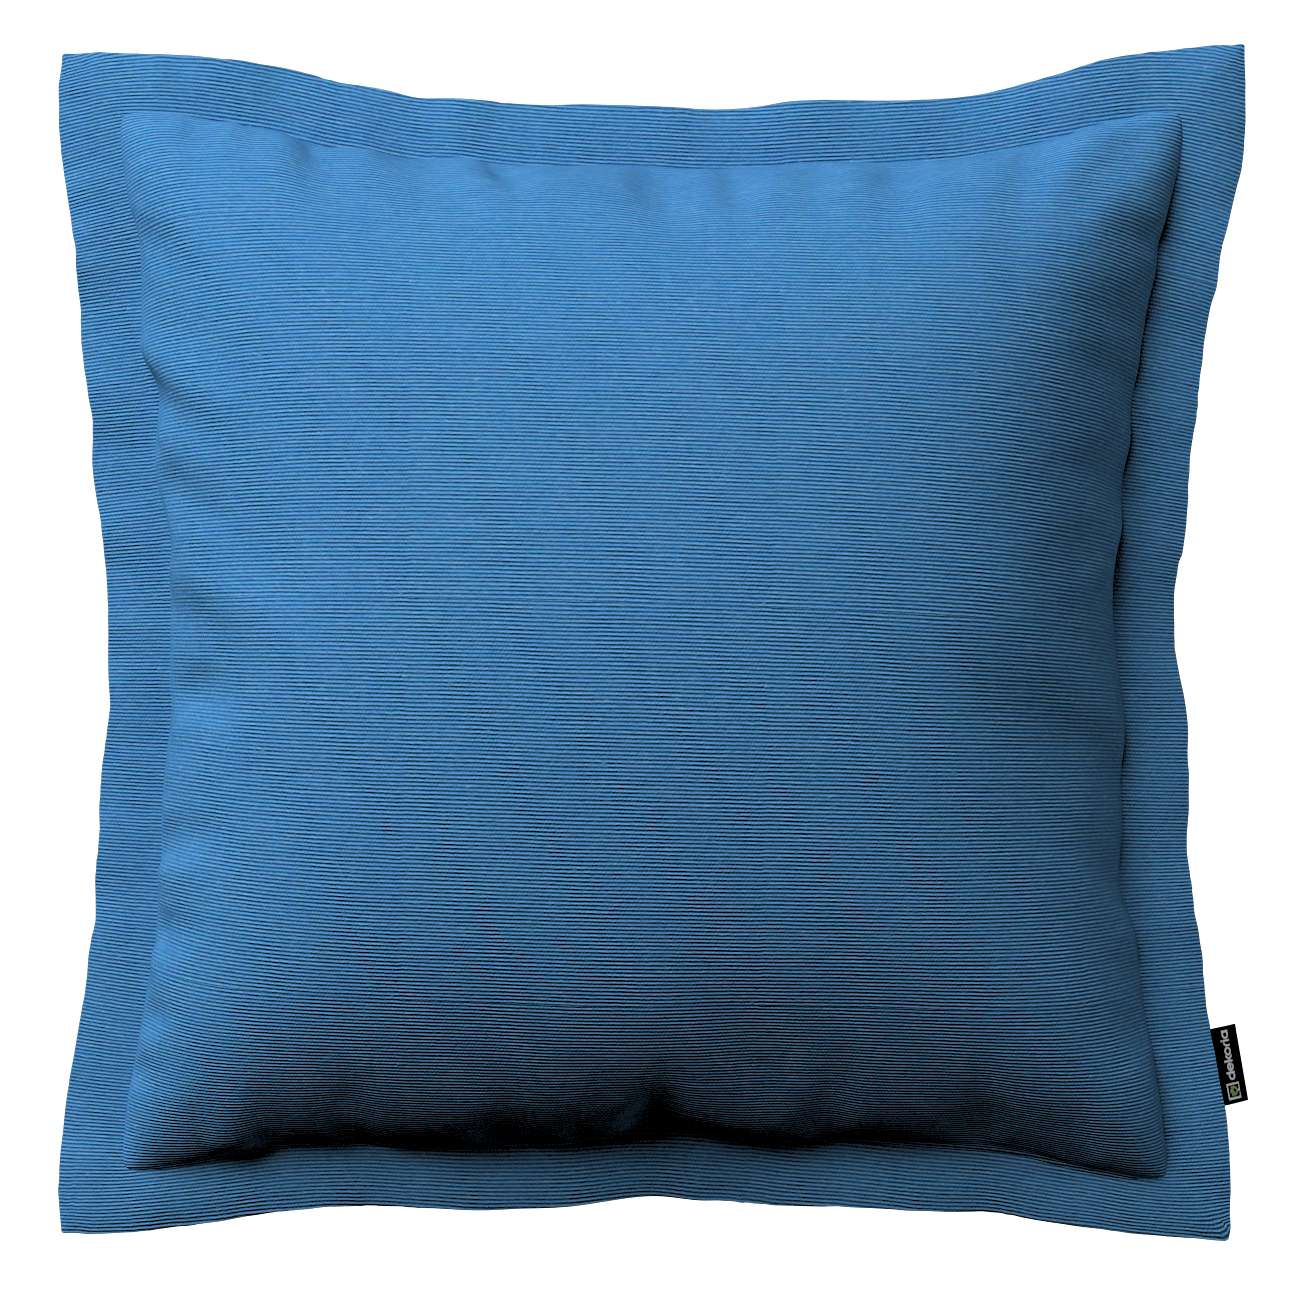 Poszewka Mona na poduszkę w kolekcji Jupiter, tkanina: 127-61